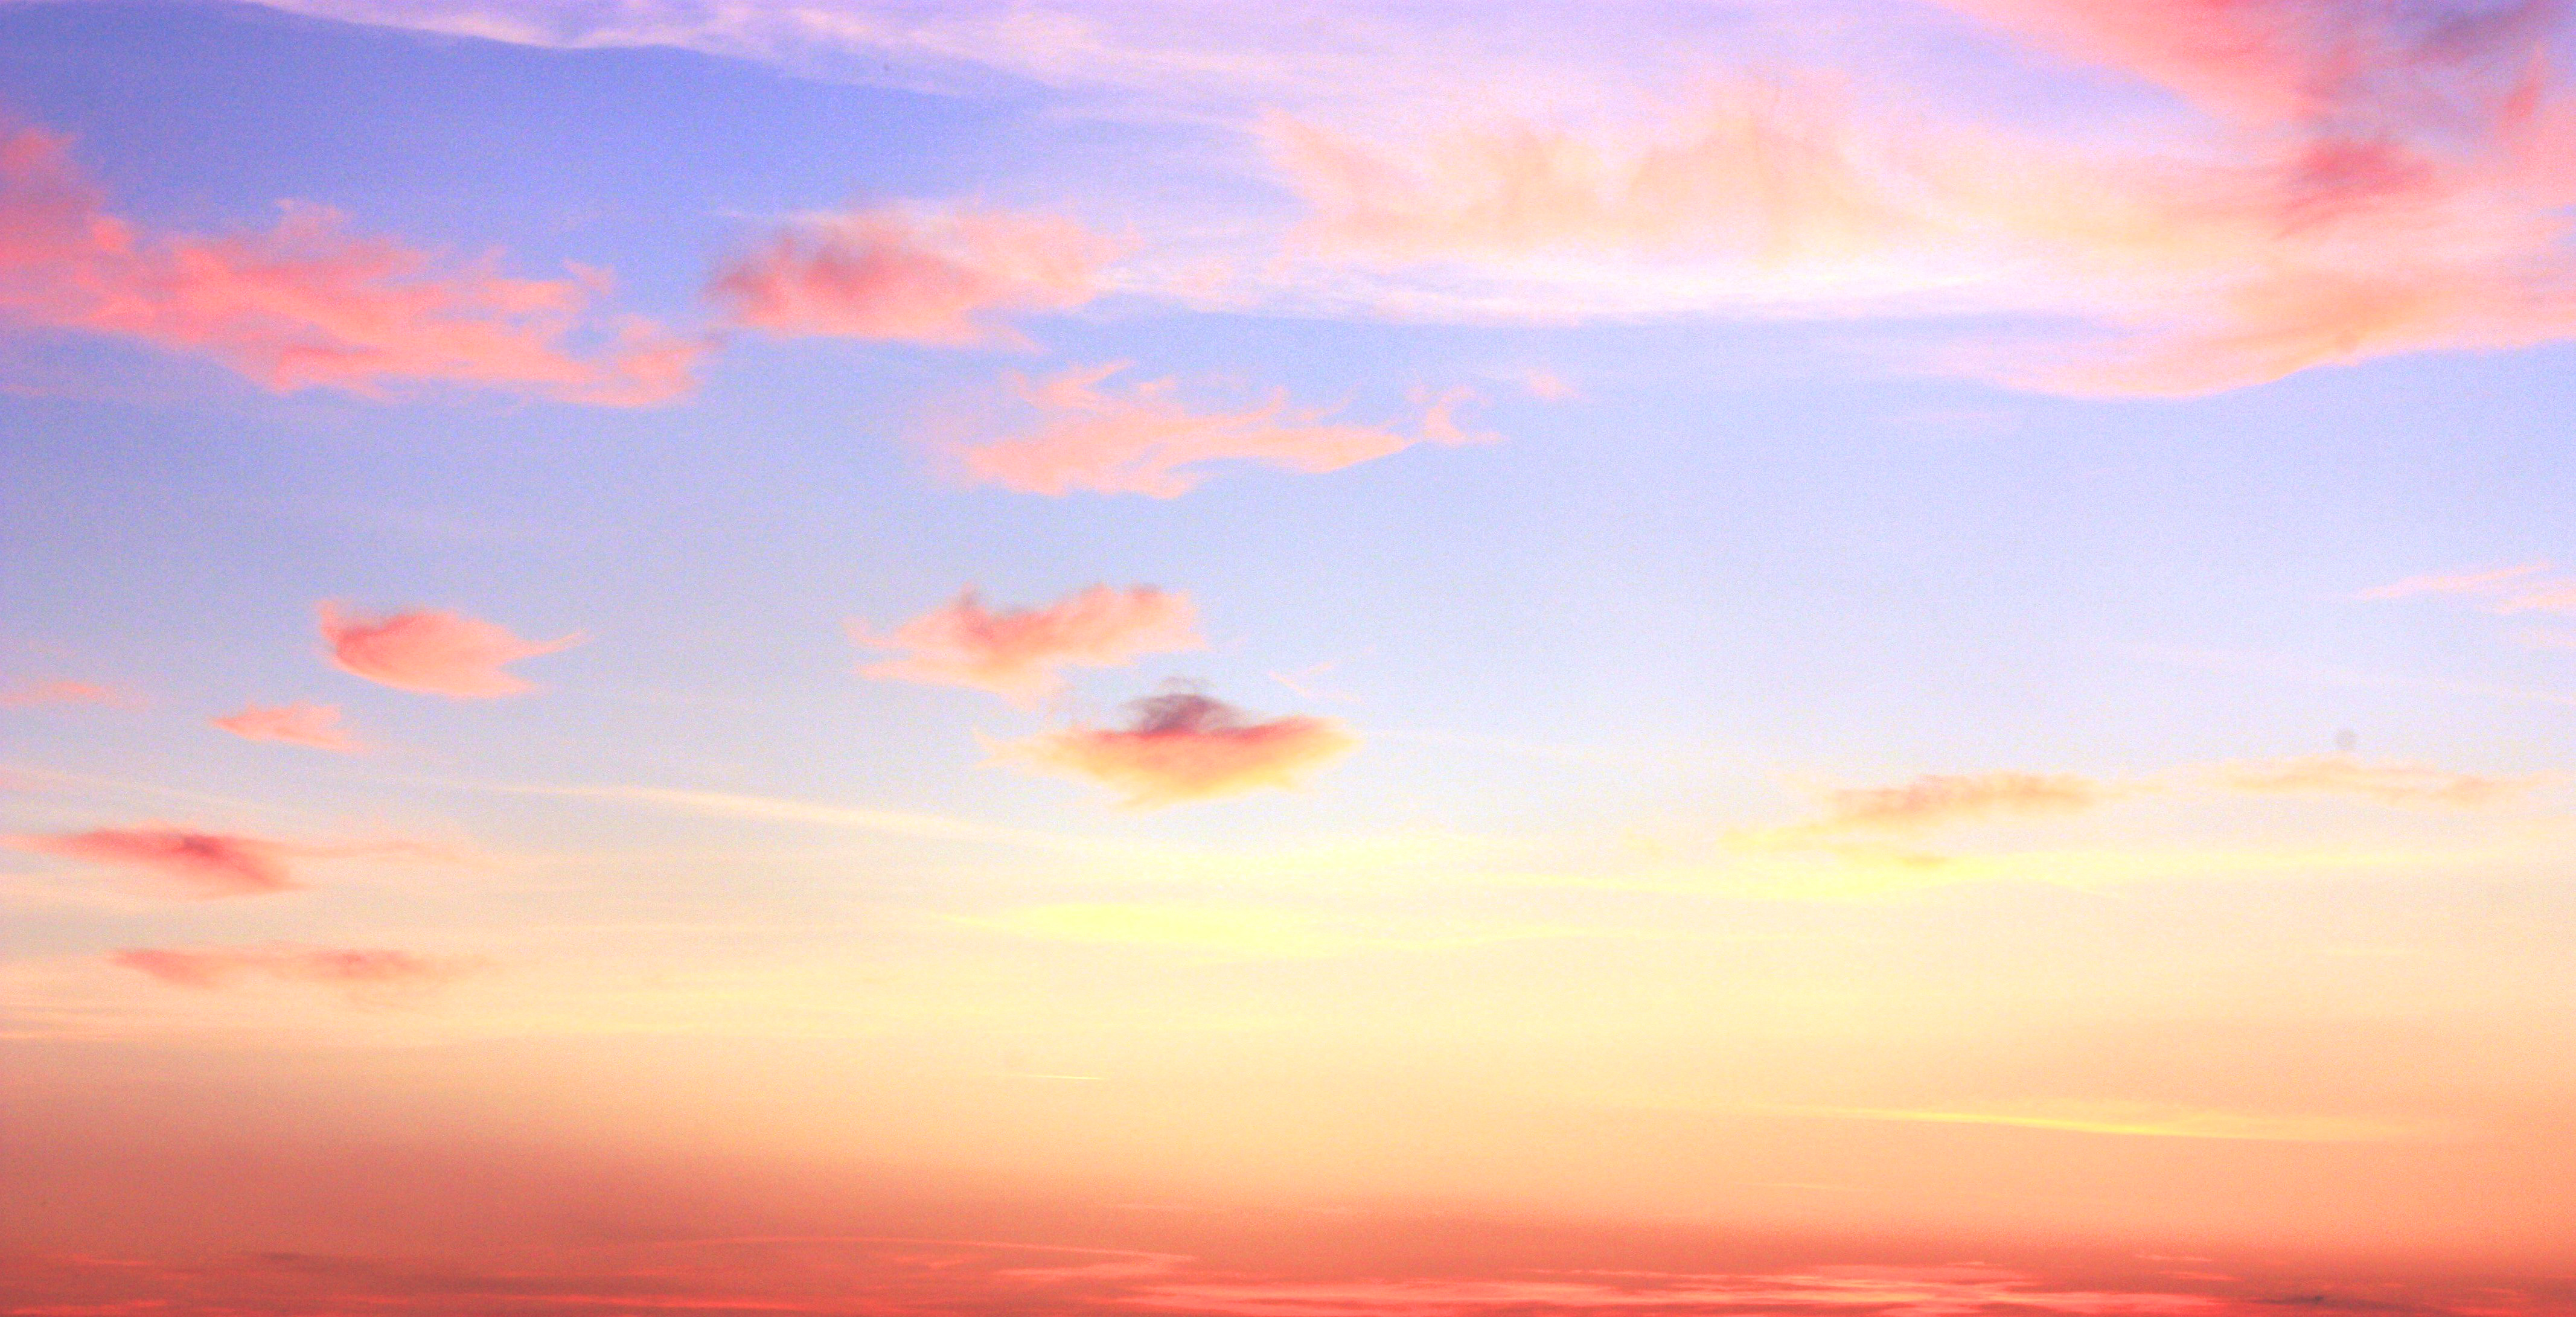 Birthday Background Wallpaper Hd Travel Theme Sky Lucid Gypsy